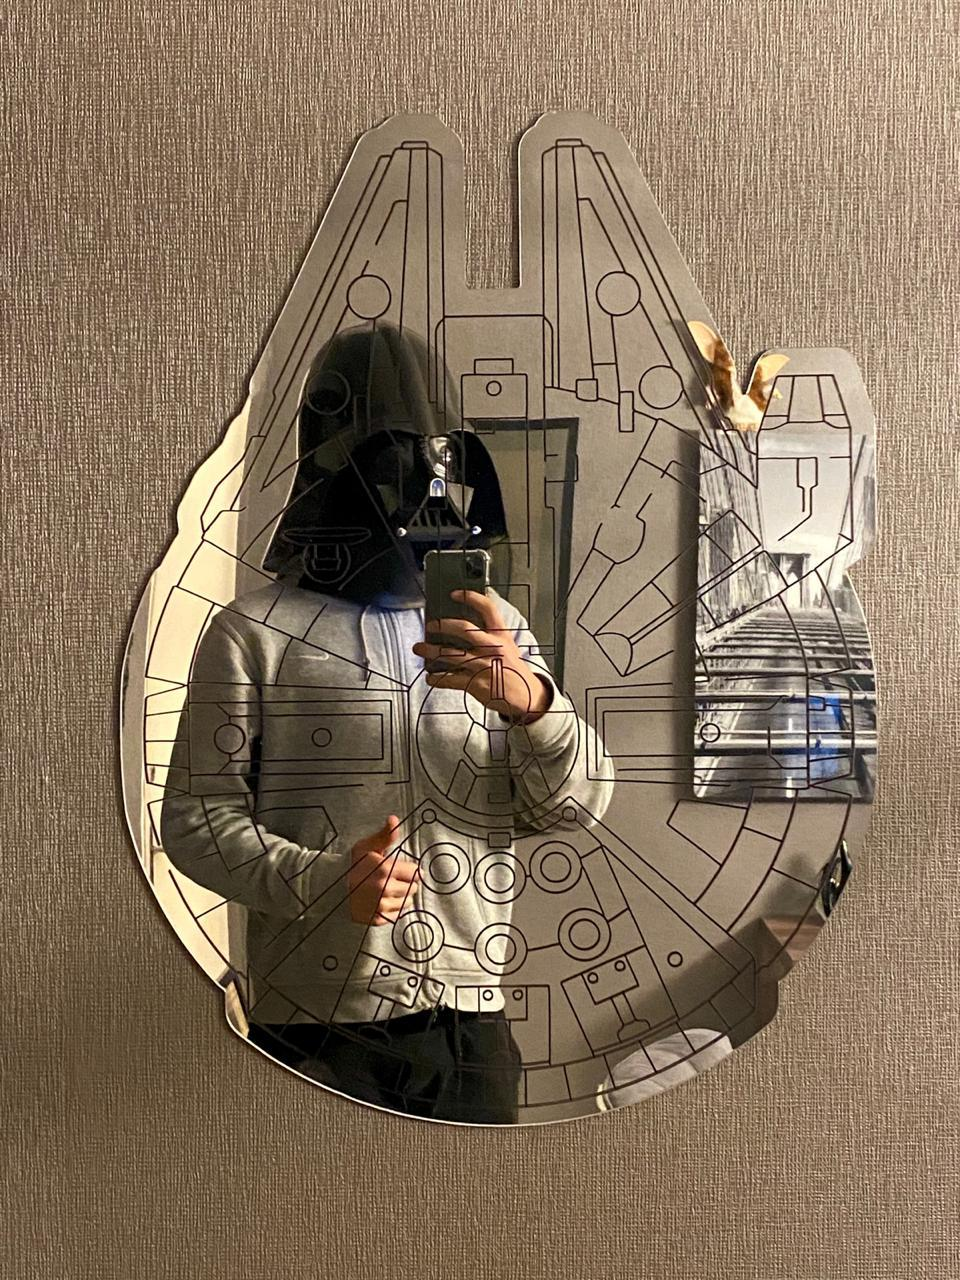 Espelho Acrílico Millennium Falcon: Star Wars (Disney)